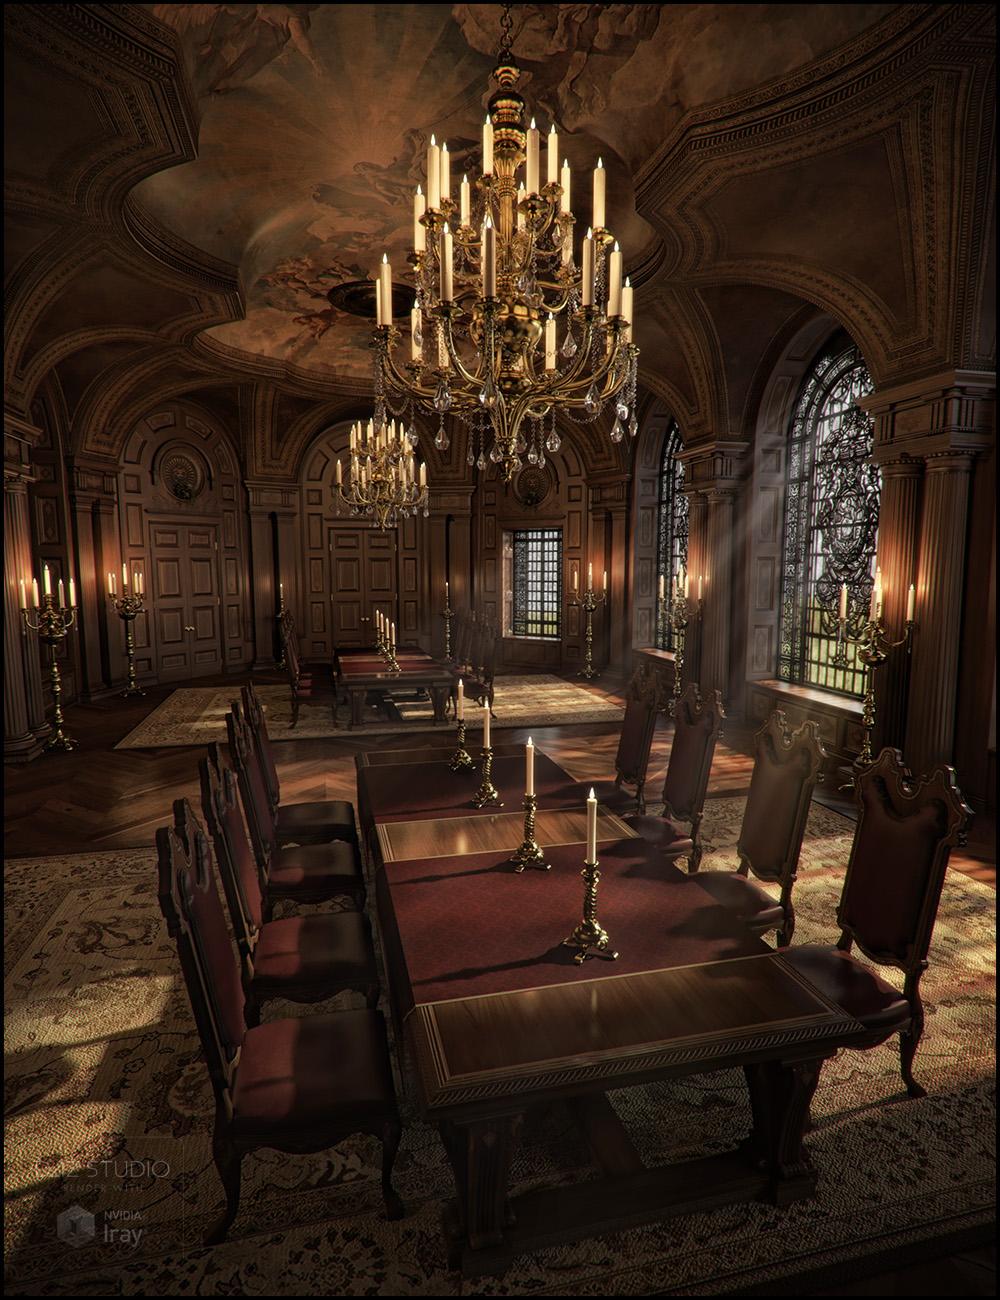 Baroque Grandeur Iray Addon by: Jack Tomalin, 3D Models by Daz 3D